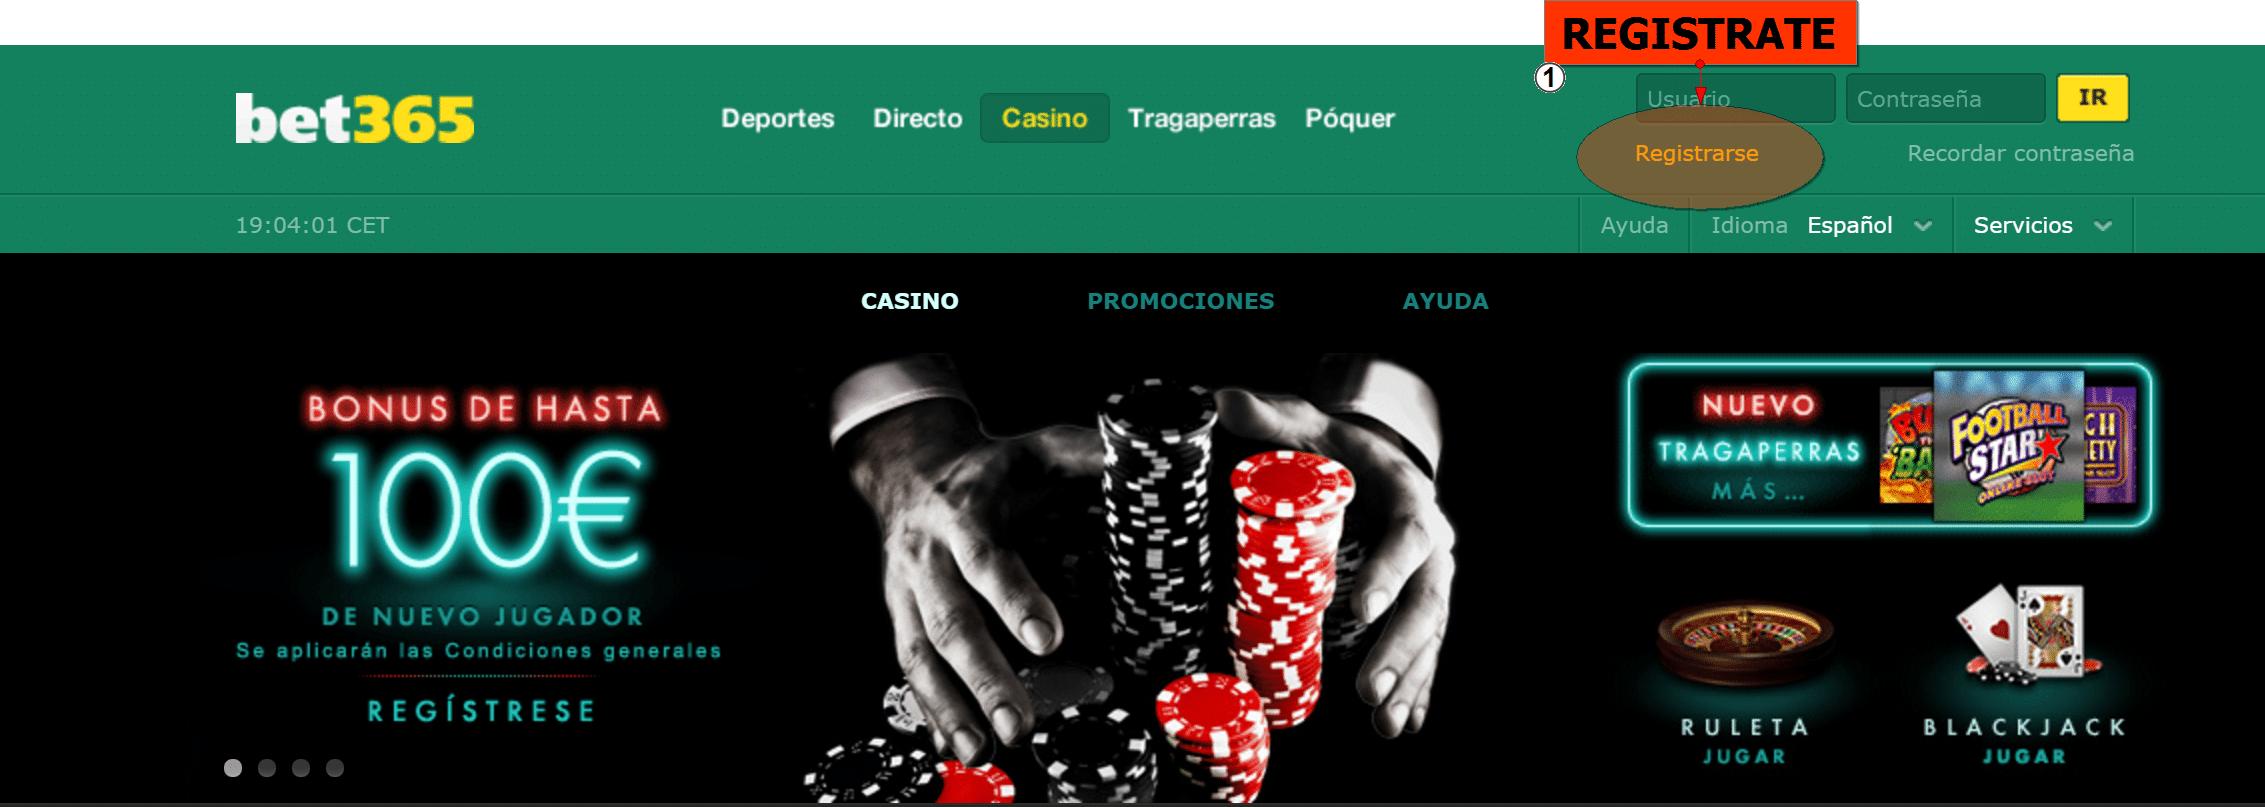 Juegos de casino online bono bet365 Bolivia 648335